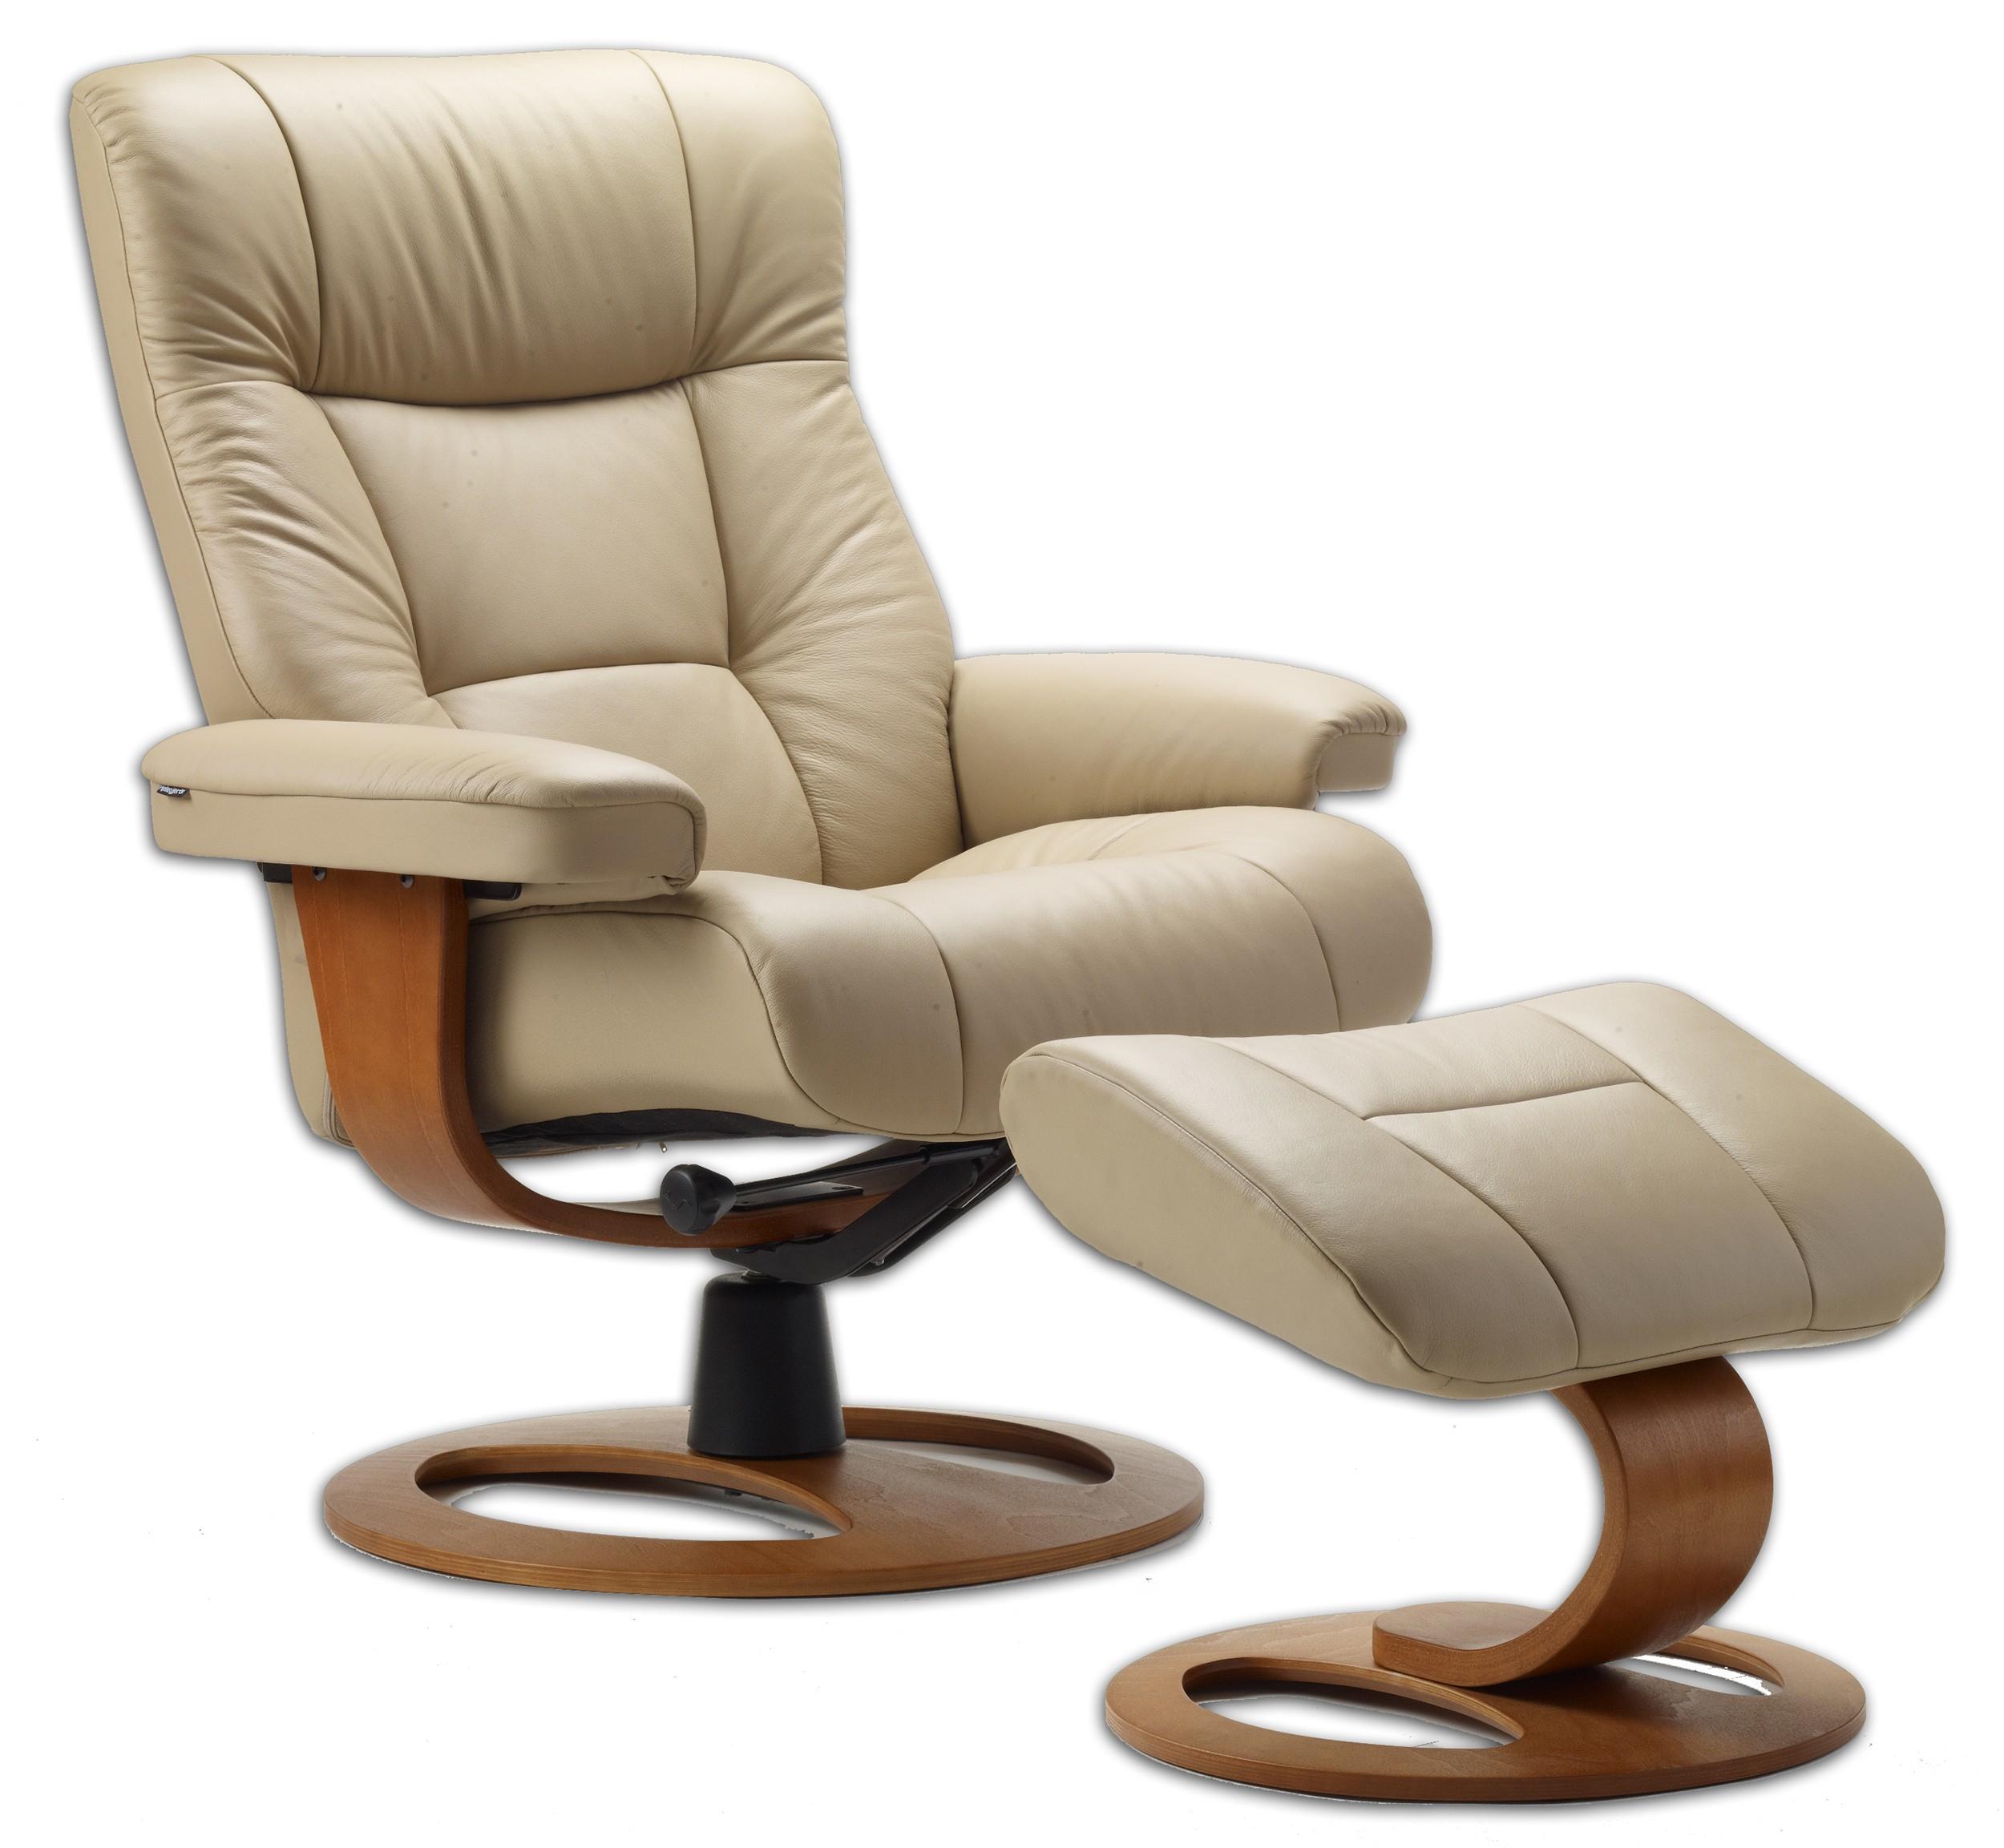 Charmant Fjords Manjana Leather Recliner DR Frame Norwegian Ergonomic Scandinavian  Lounge Reclining Chair Furniture Soft Line Genuine